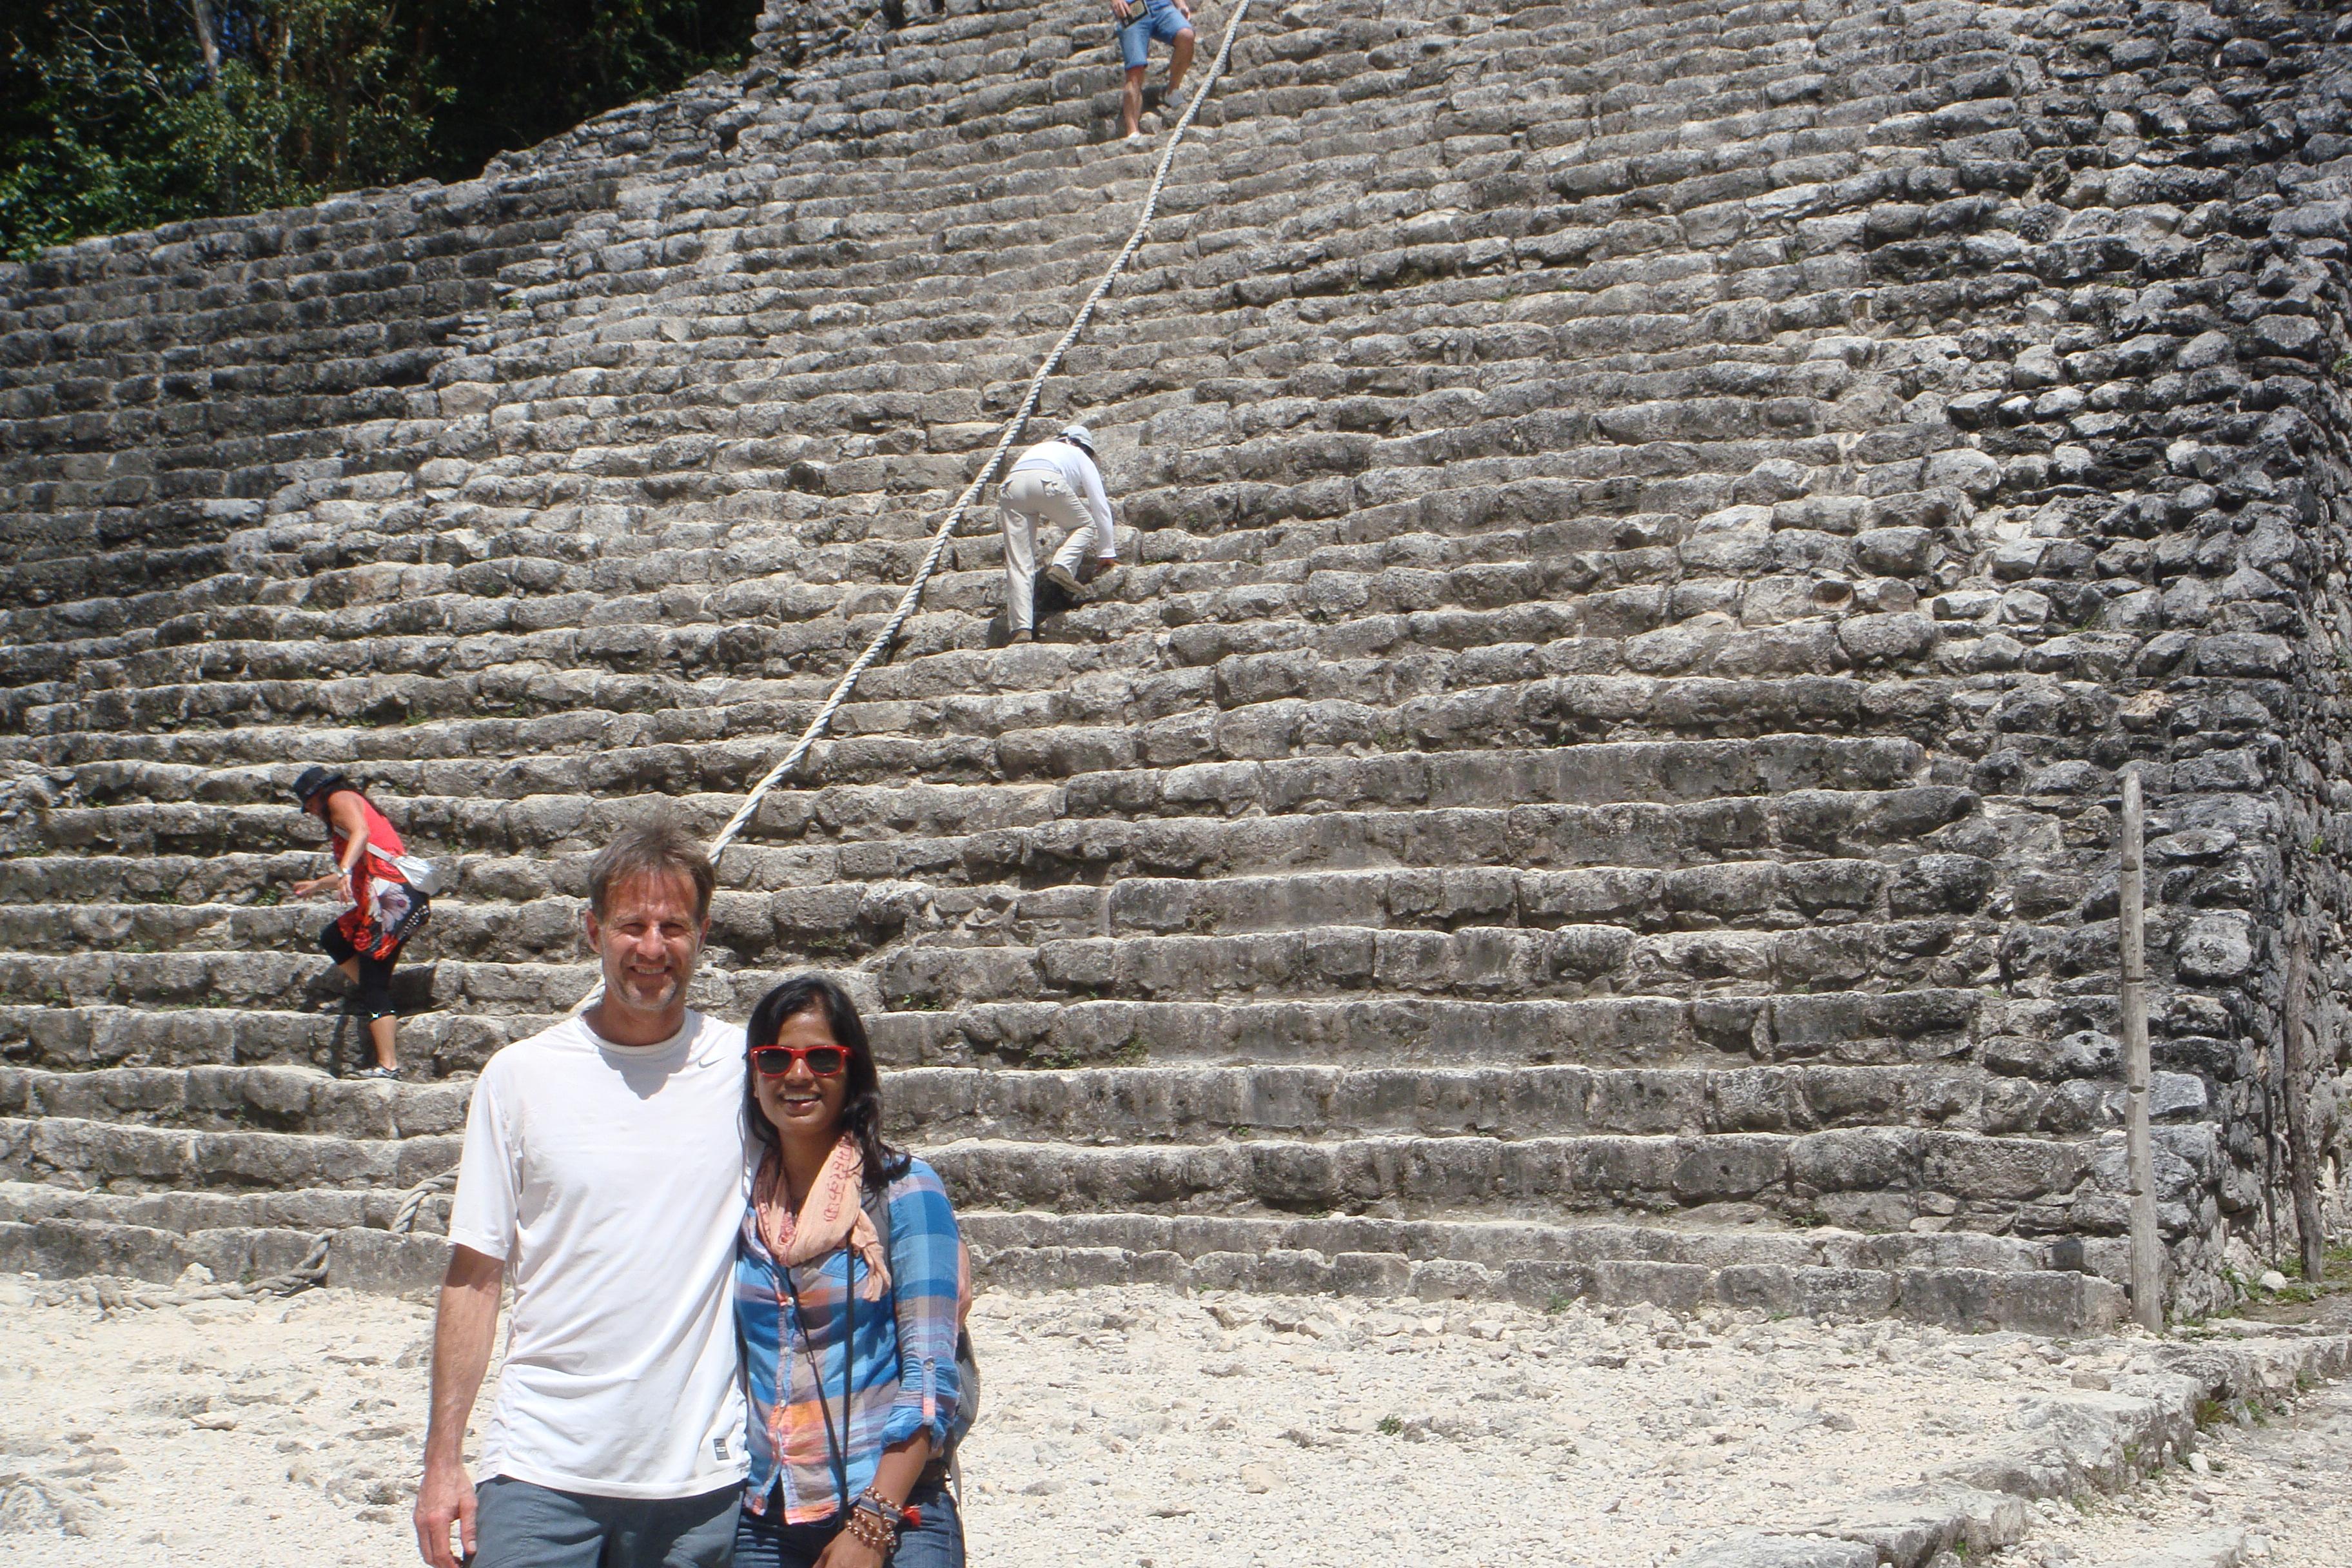 Exploring the Mayan ruins.